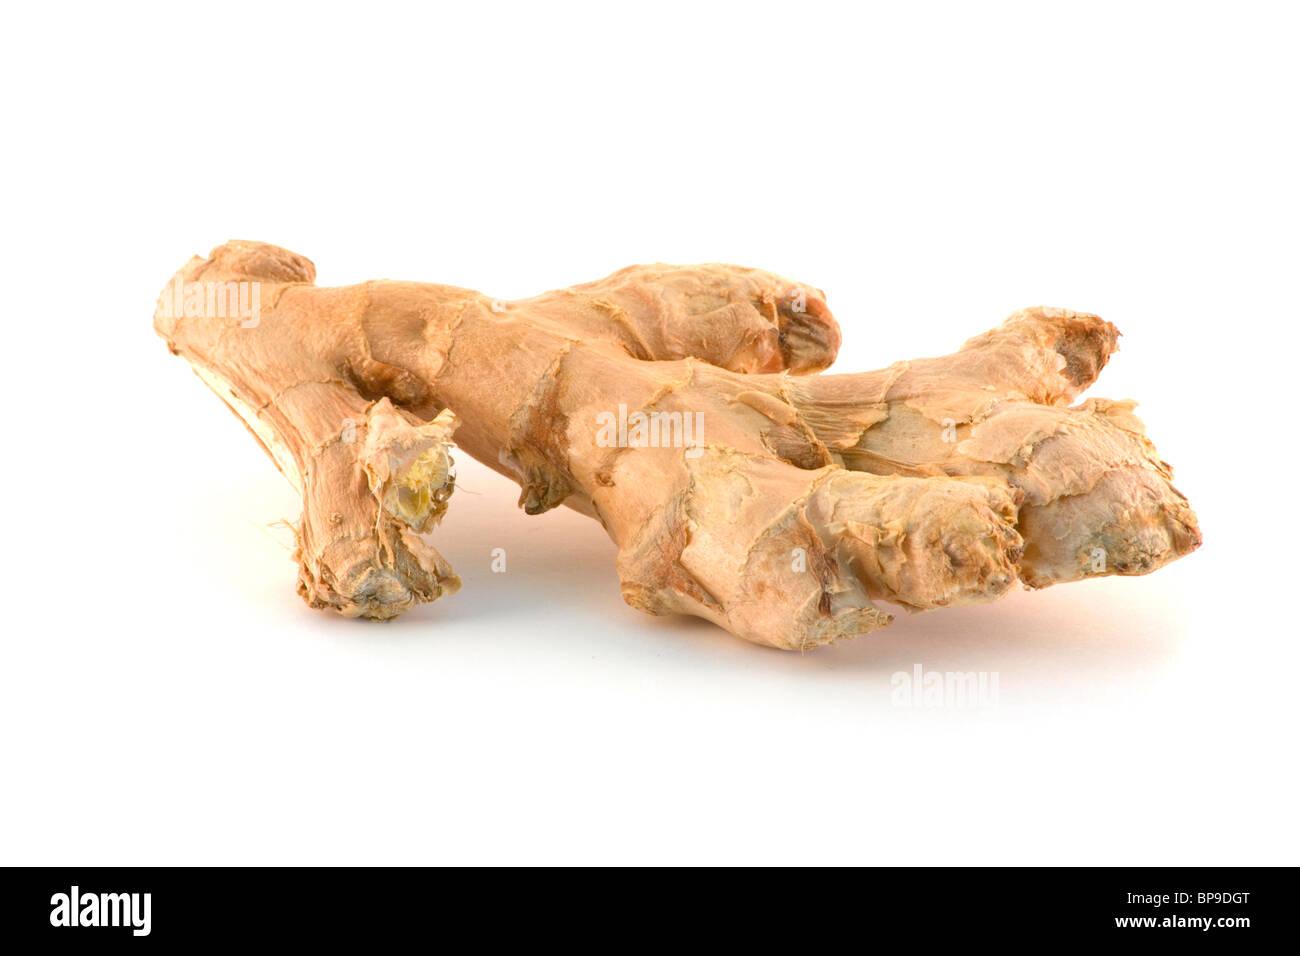 Fresh ginger root over white background - Stock Image